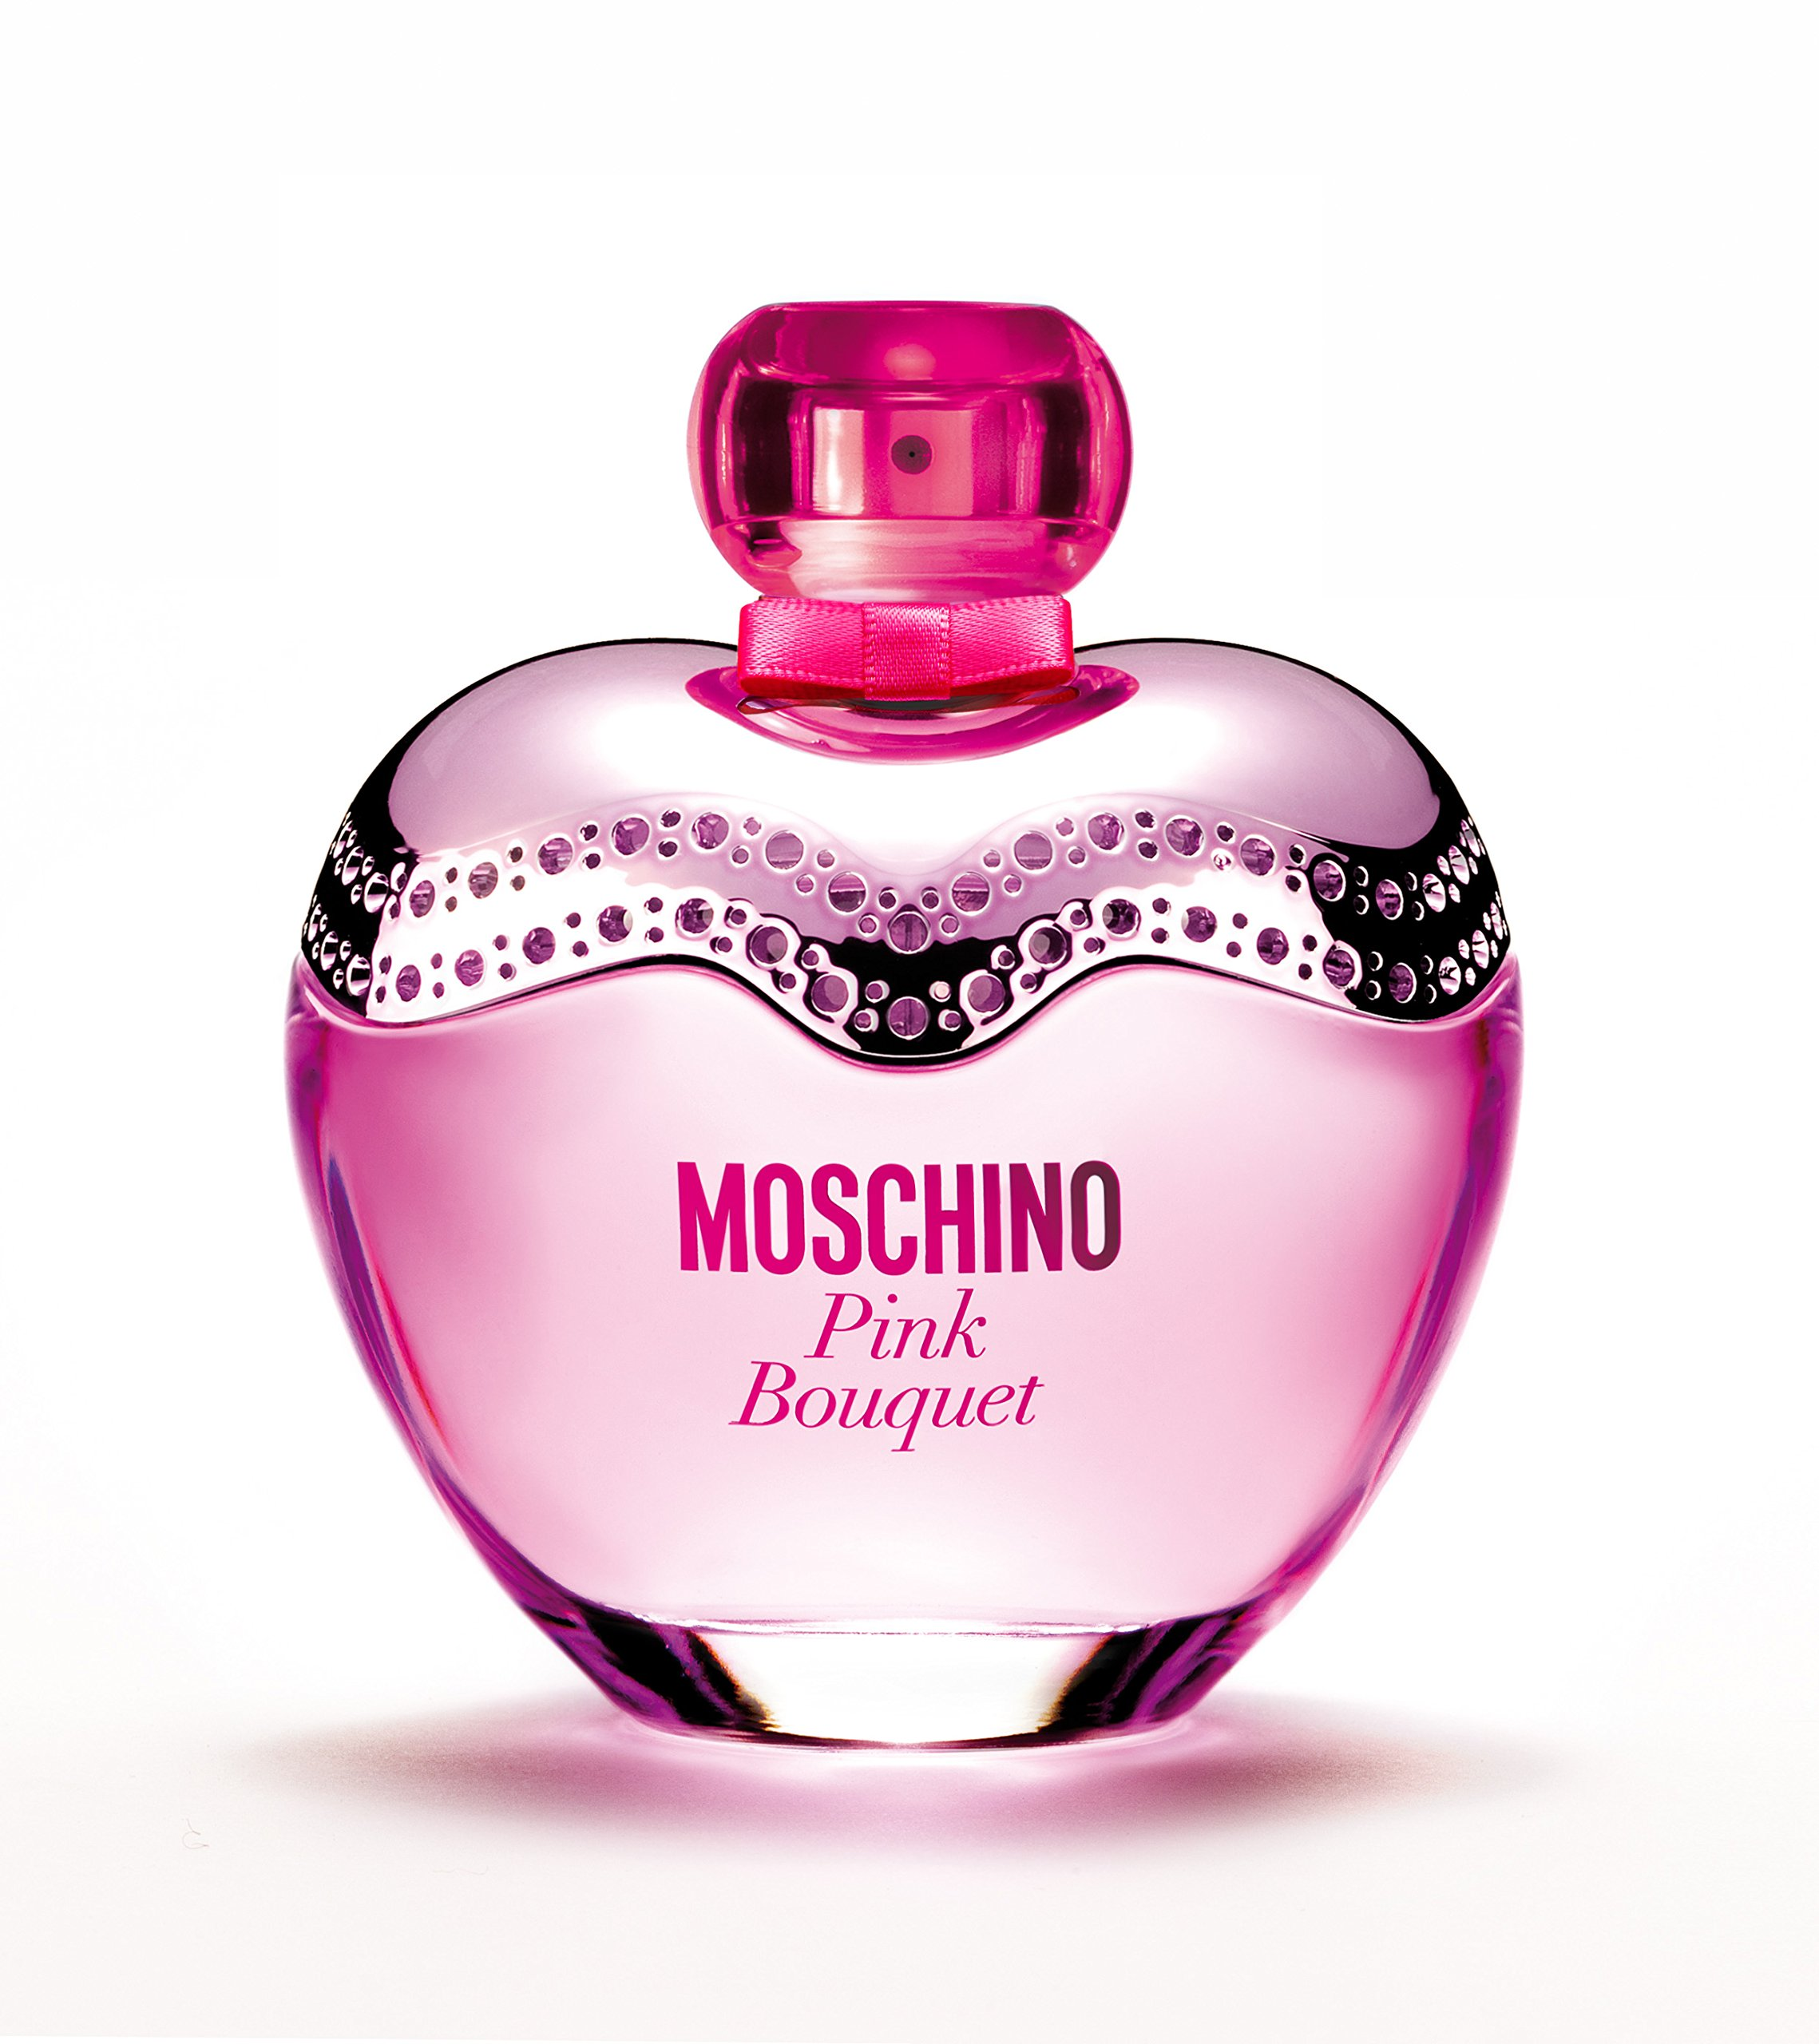 Amazon.com : Moshino Glamour by Moschino 100ml 3.4oz EDP